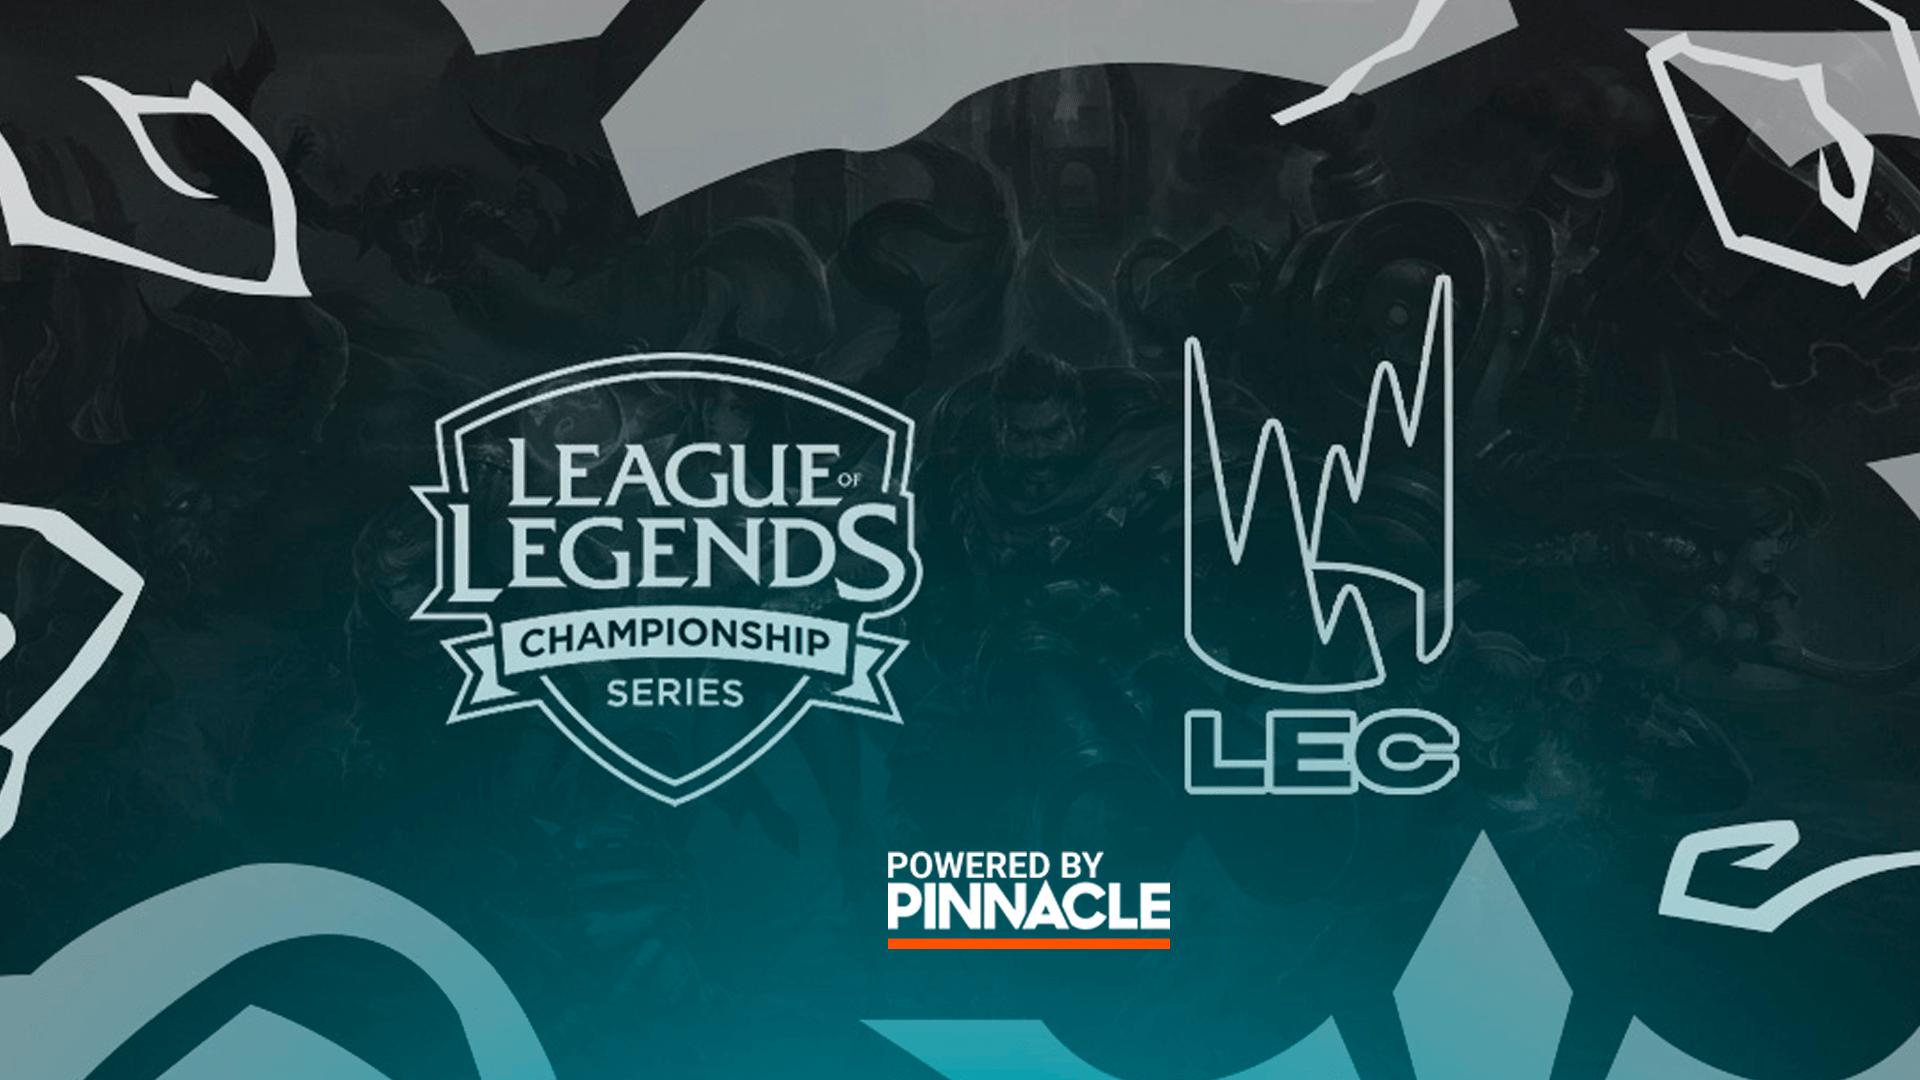 Прогнозы на матчи LEC и LCS по League of Legends